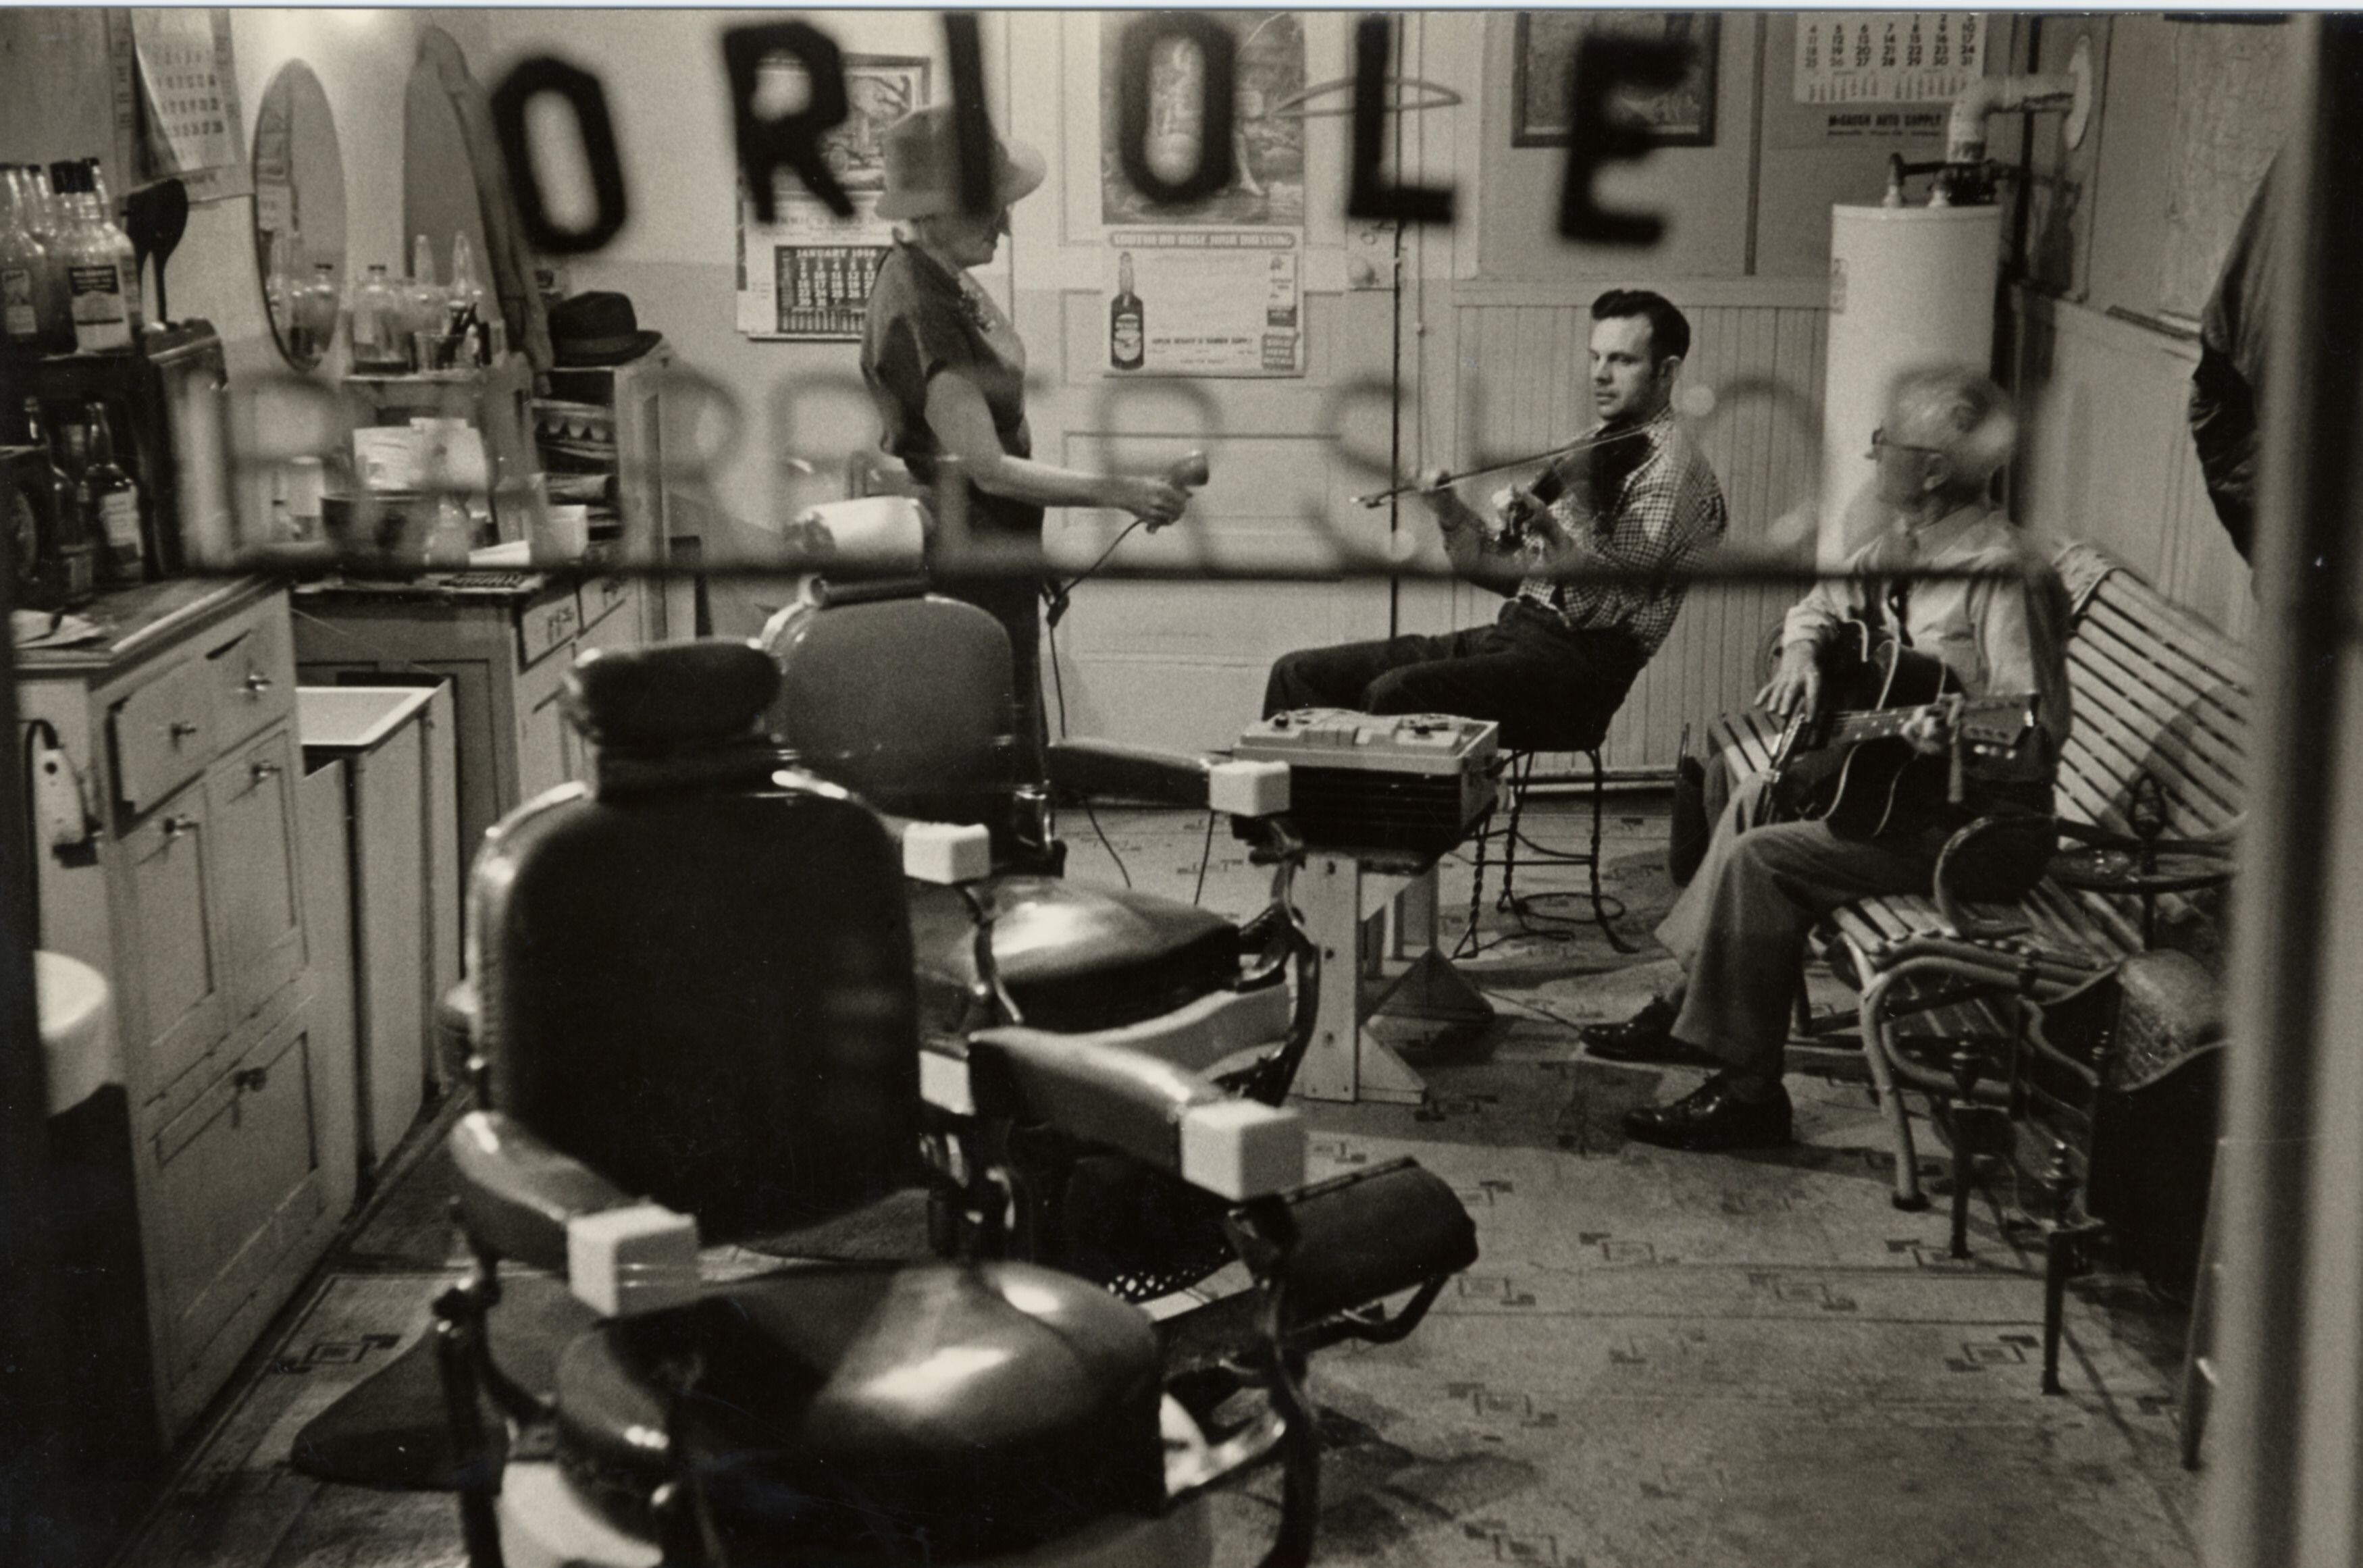 Vintage Barbershop 1950s shopping ...